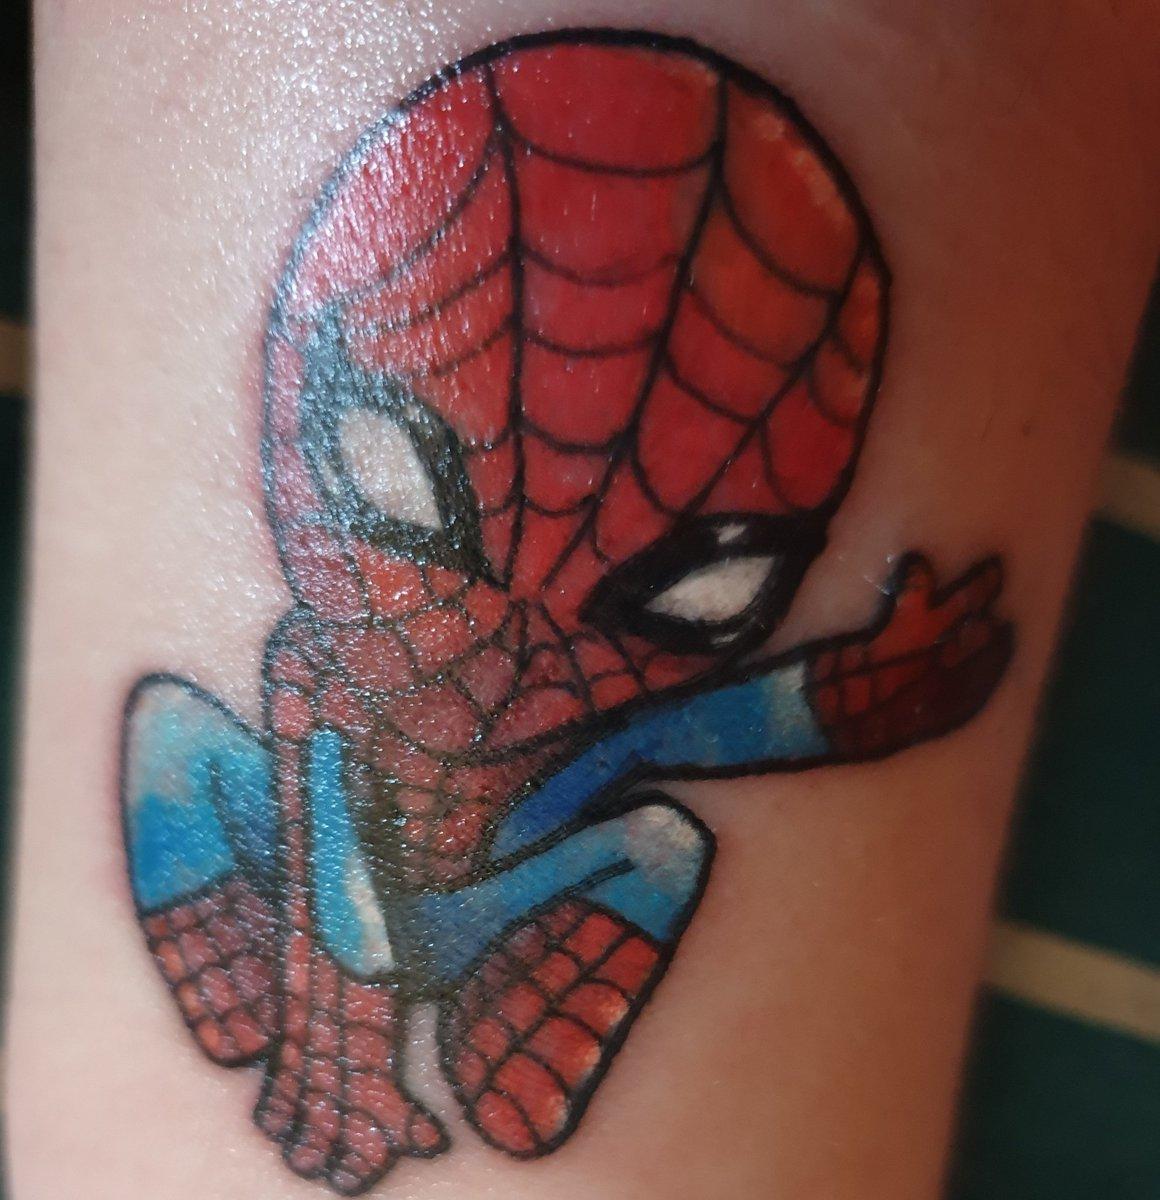 #Tattoo Awesome of the Day: #Marvel #Spiderman Forearm Piece via @WWEGREATFAN1994 #SamaTattoo #SamaGeek 🤓